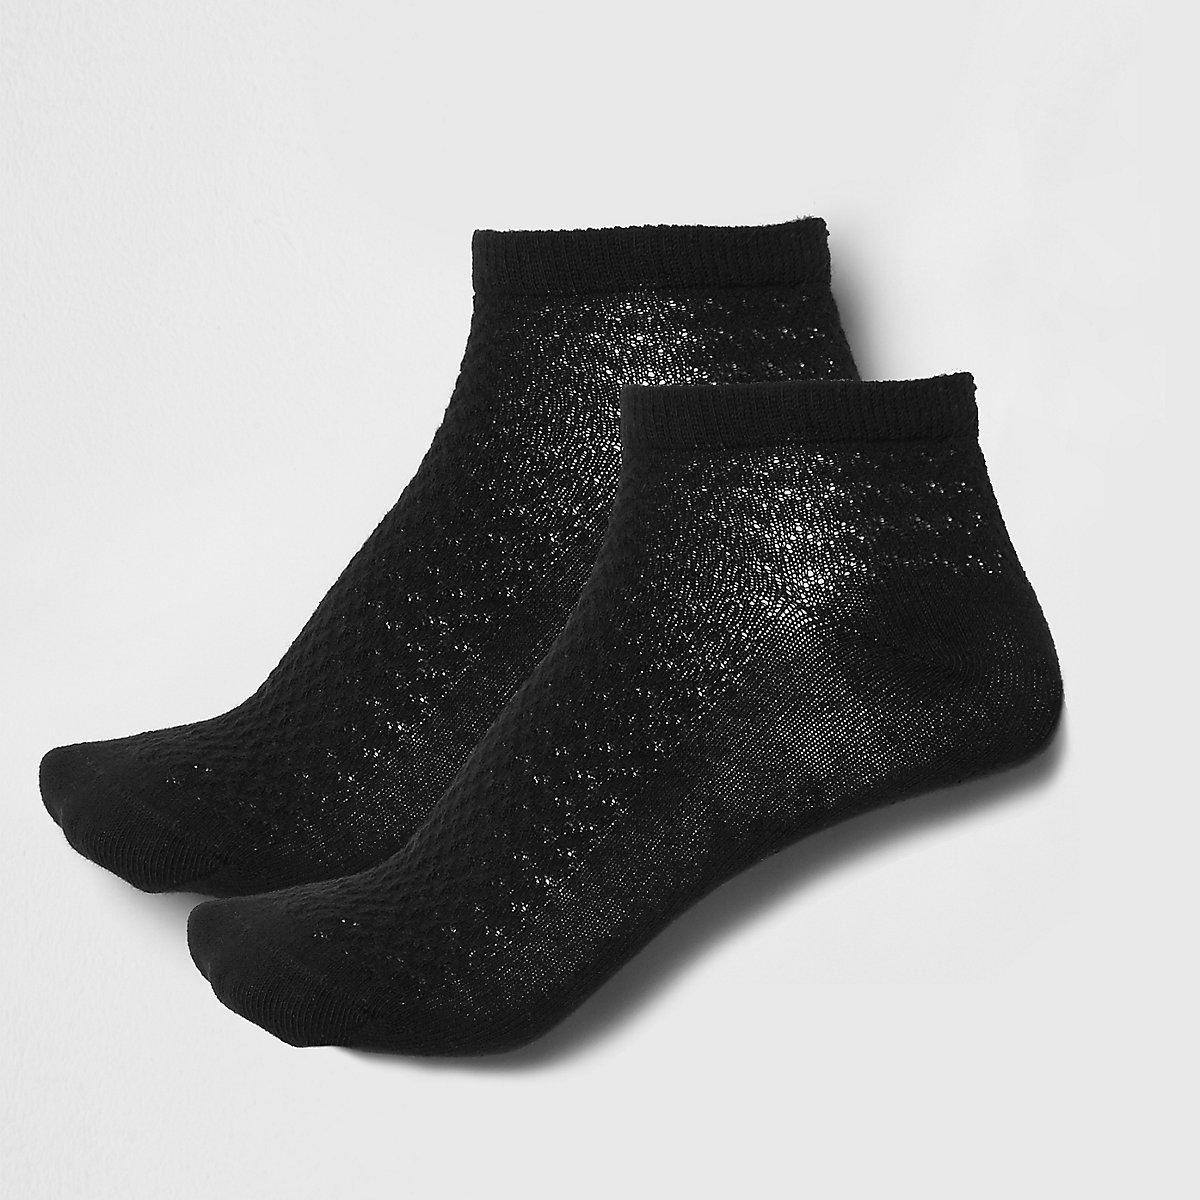 Black textured trainer socks 2 pack